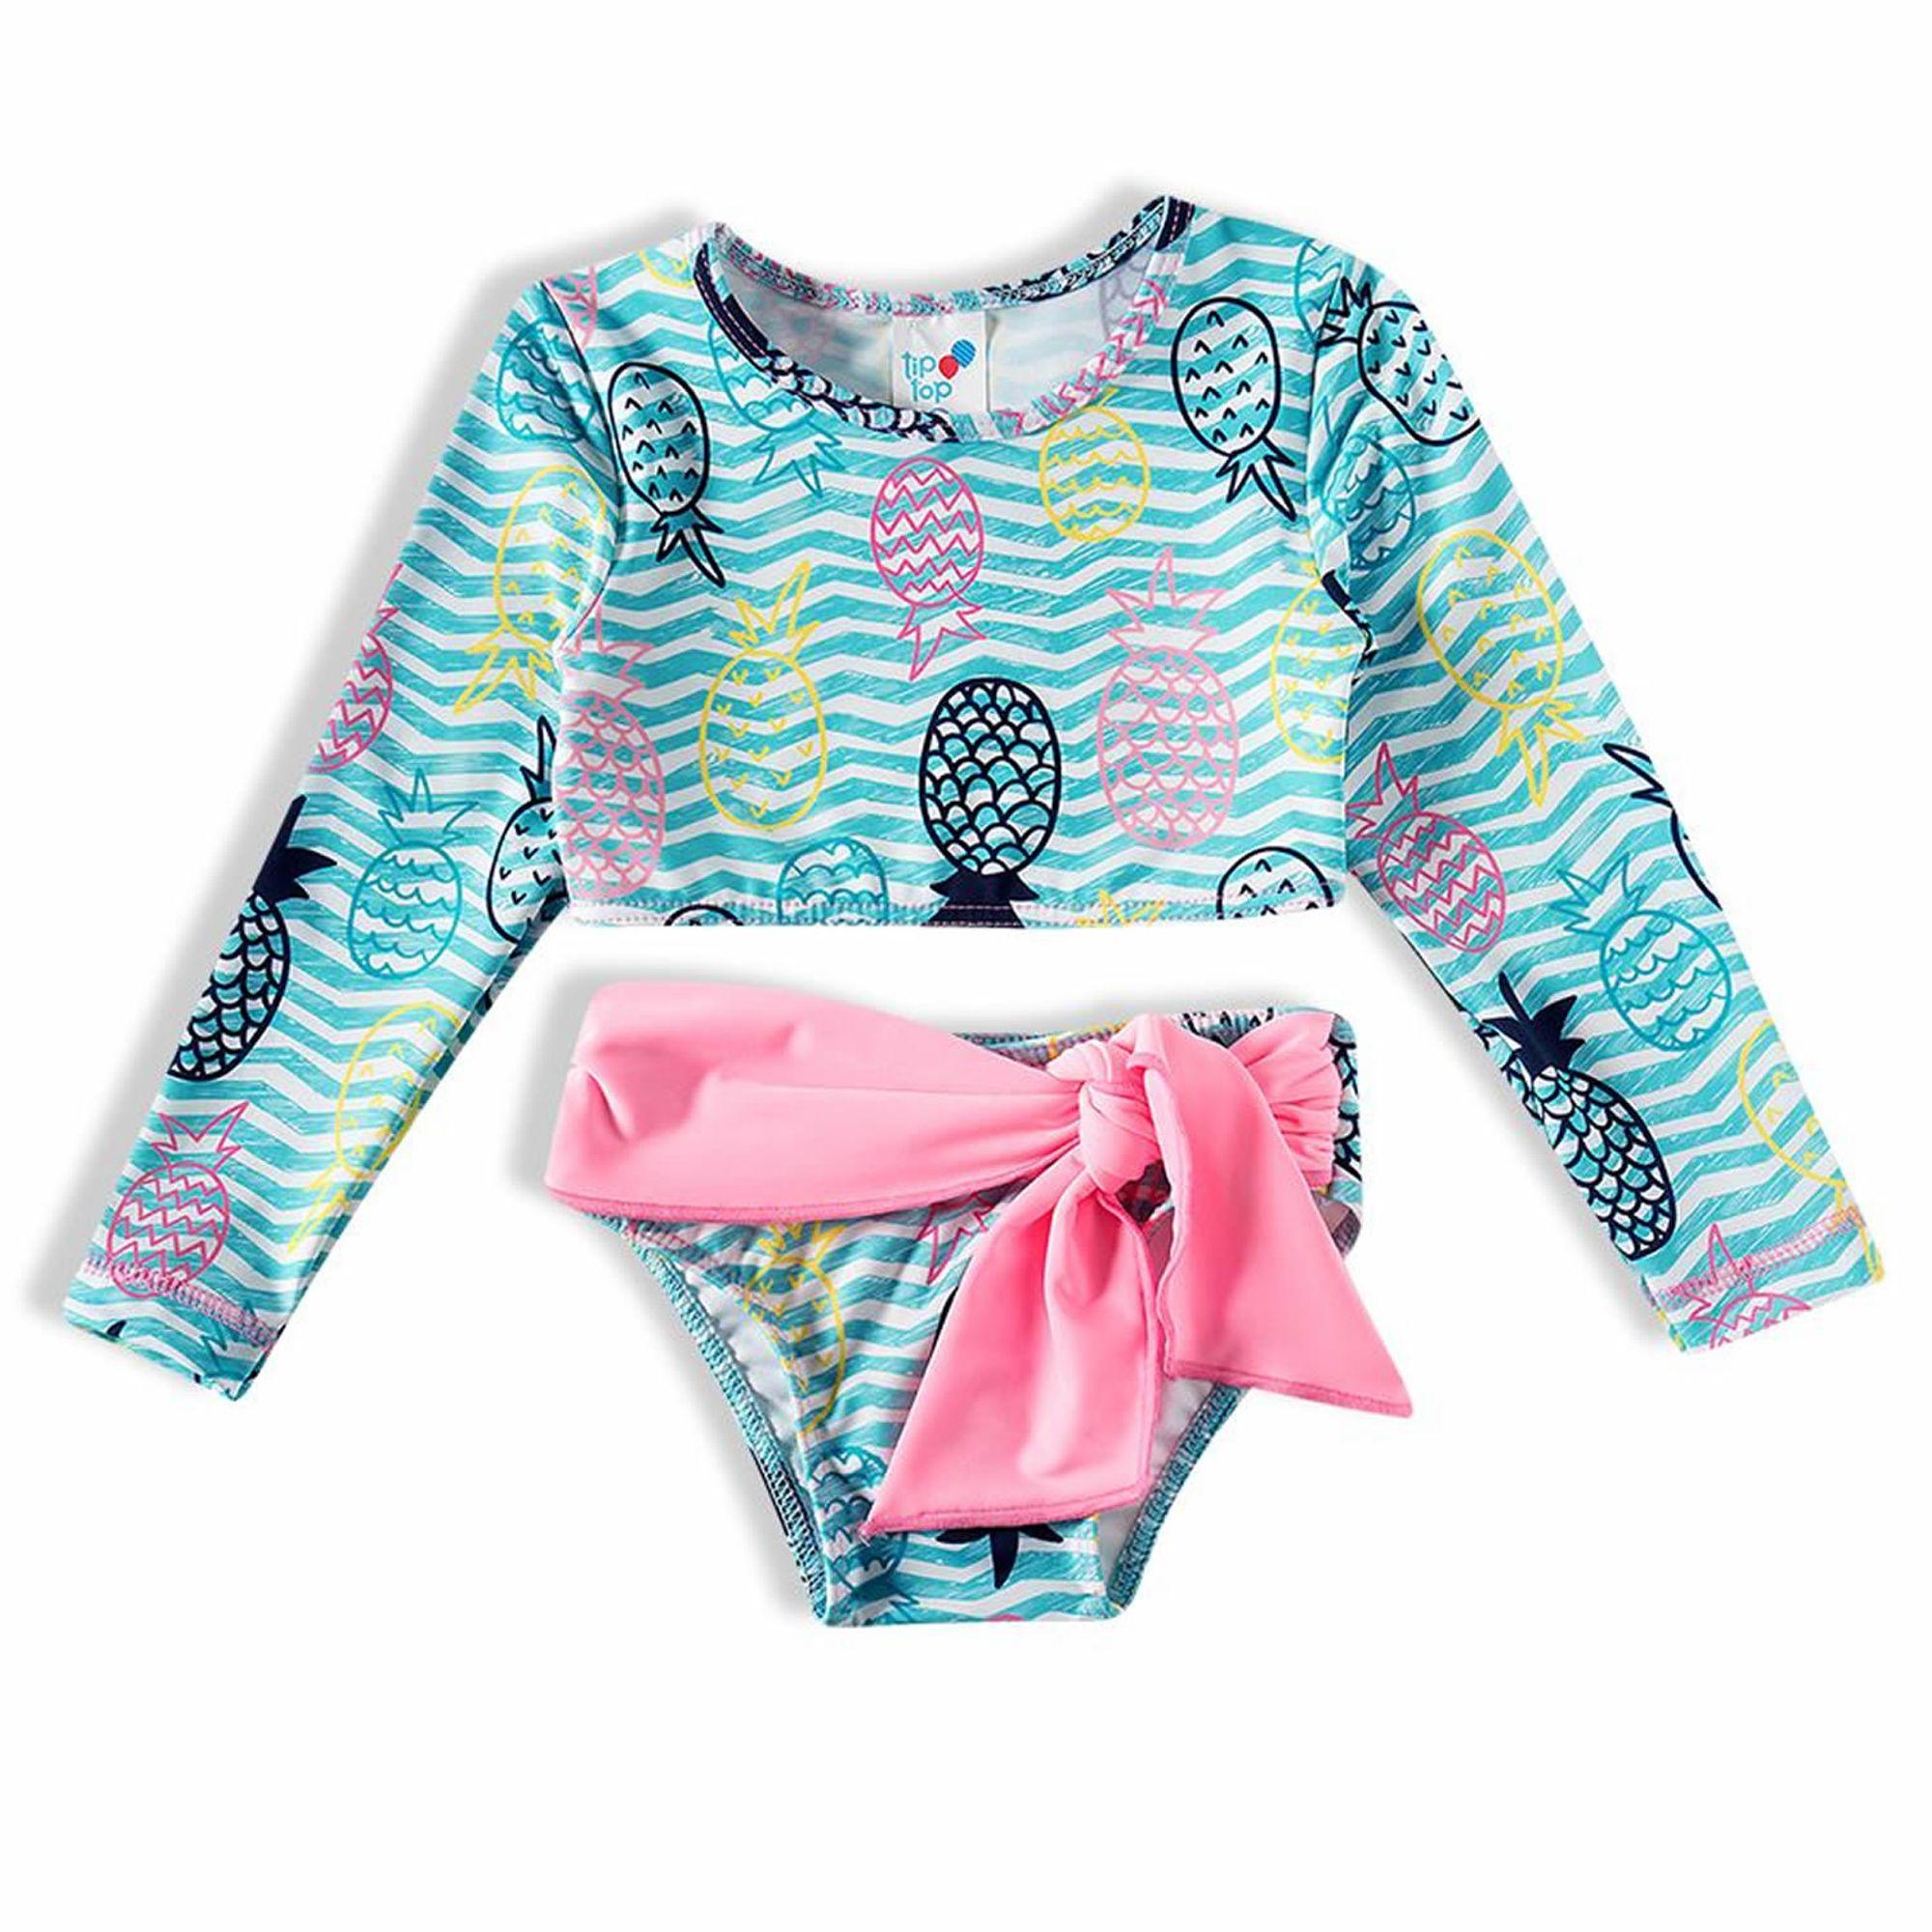 biquini-infantil-cropped-listras-turquesa-abacaxi-rosa-tip-top